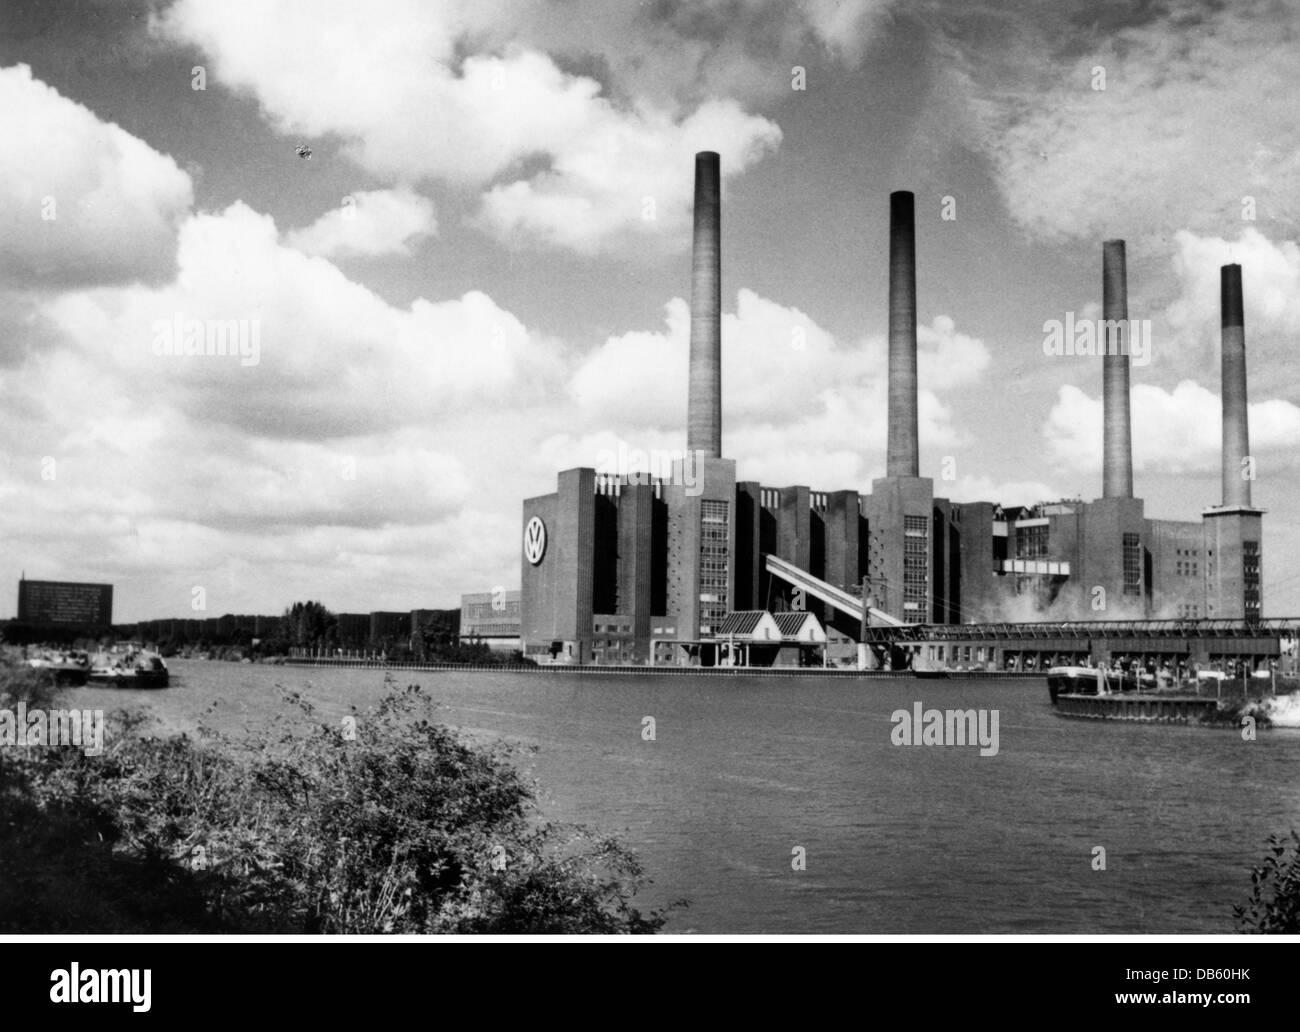 Industry cars volkswagen works in wolfsburg west germany energy supply by mittelland canal power station 1970s mittellandk